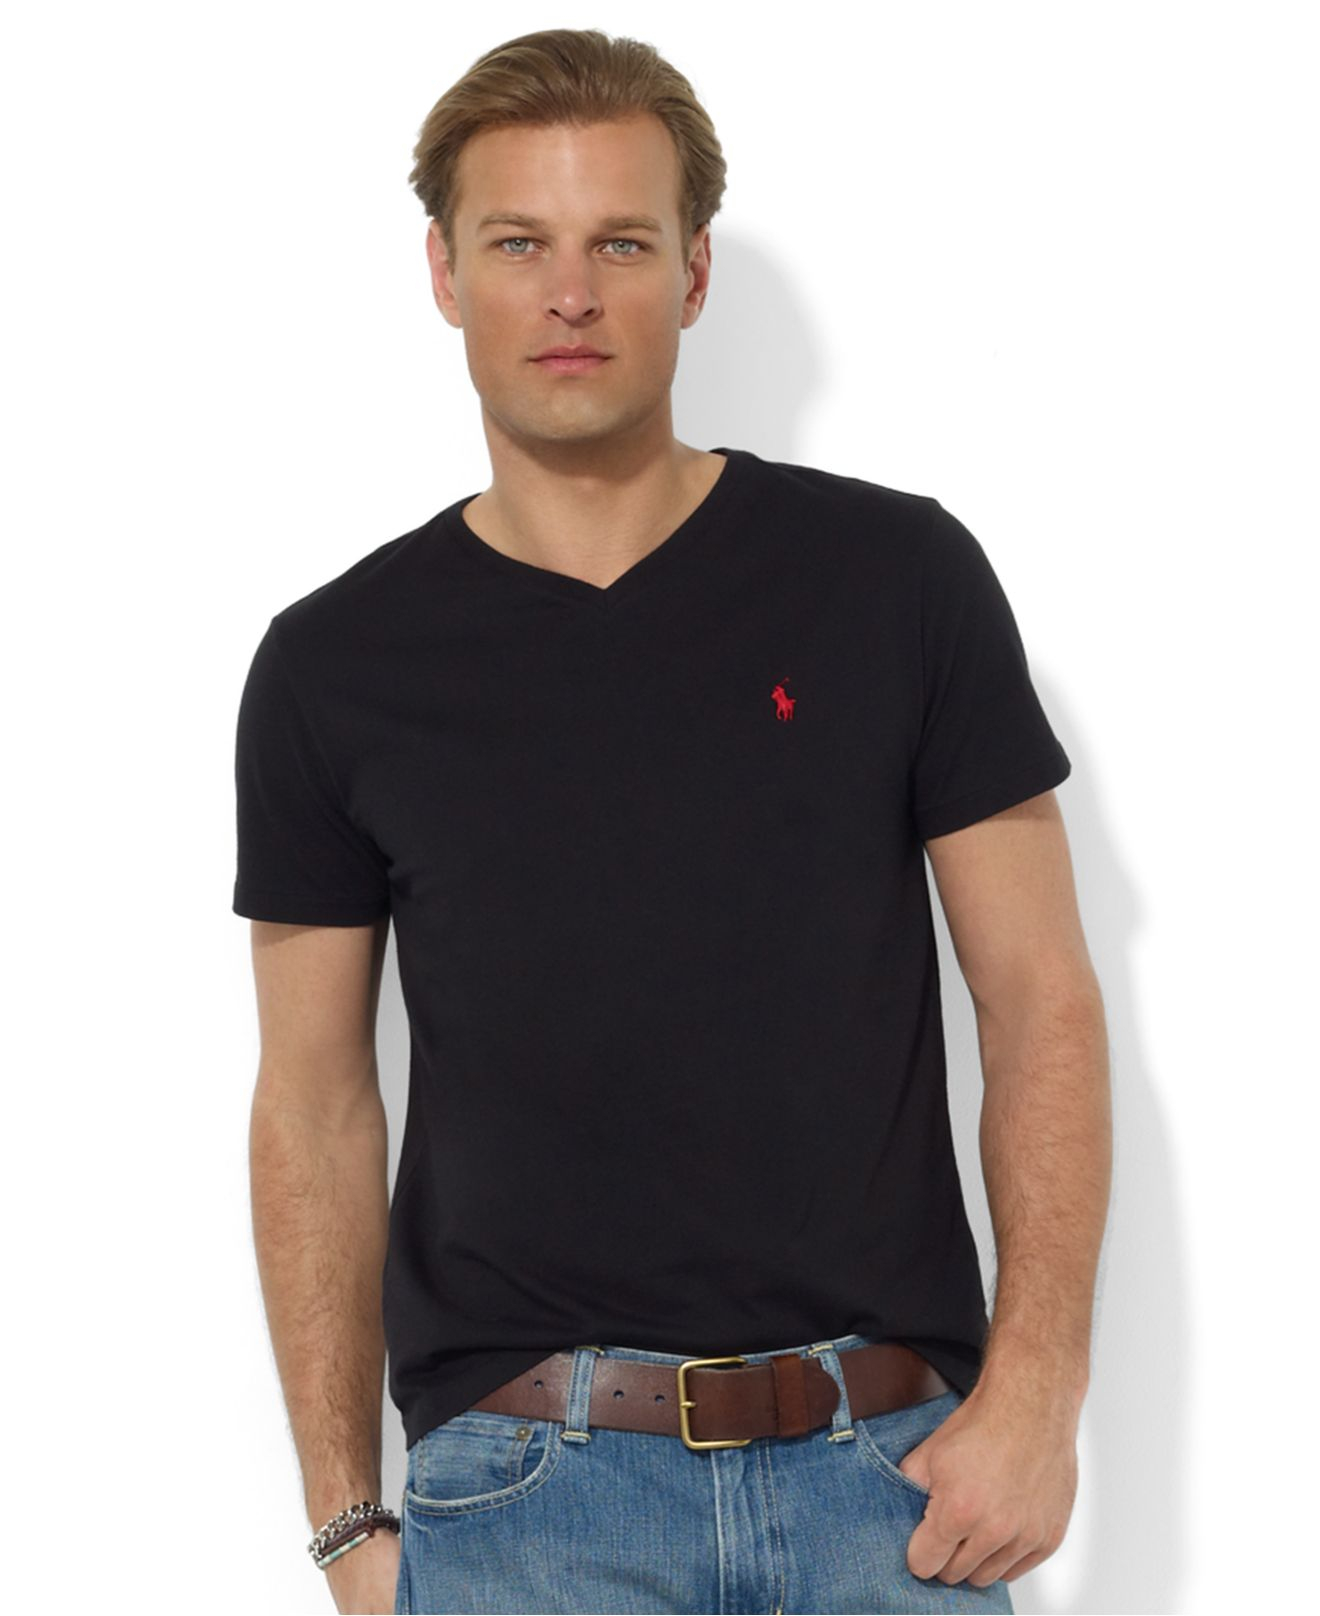 lyst polo ralph lauren core medium fit v neck t shirt in black for men. Black Bedroom Furniture Sets. Home Design Ideas